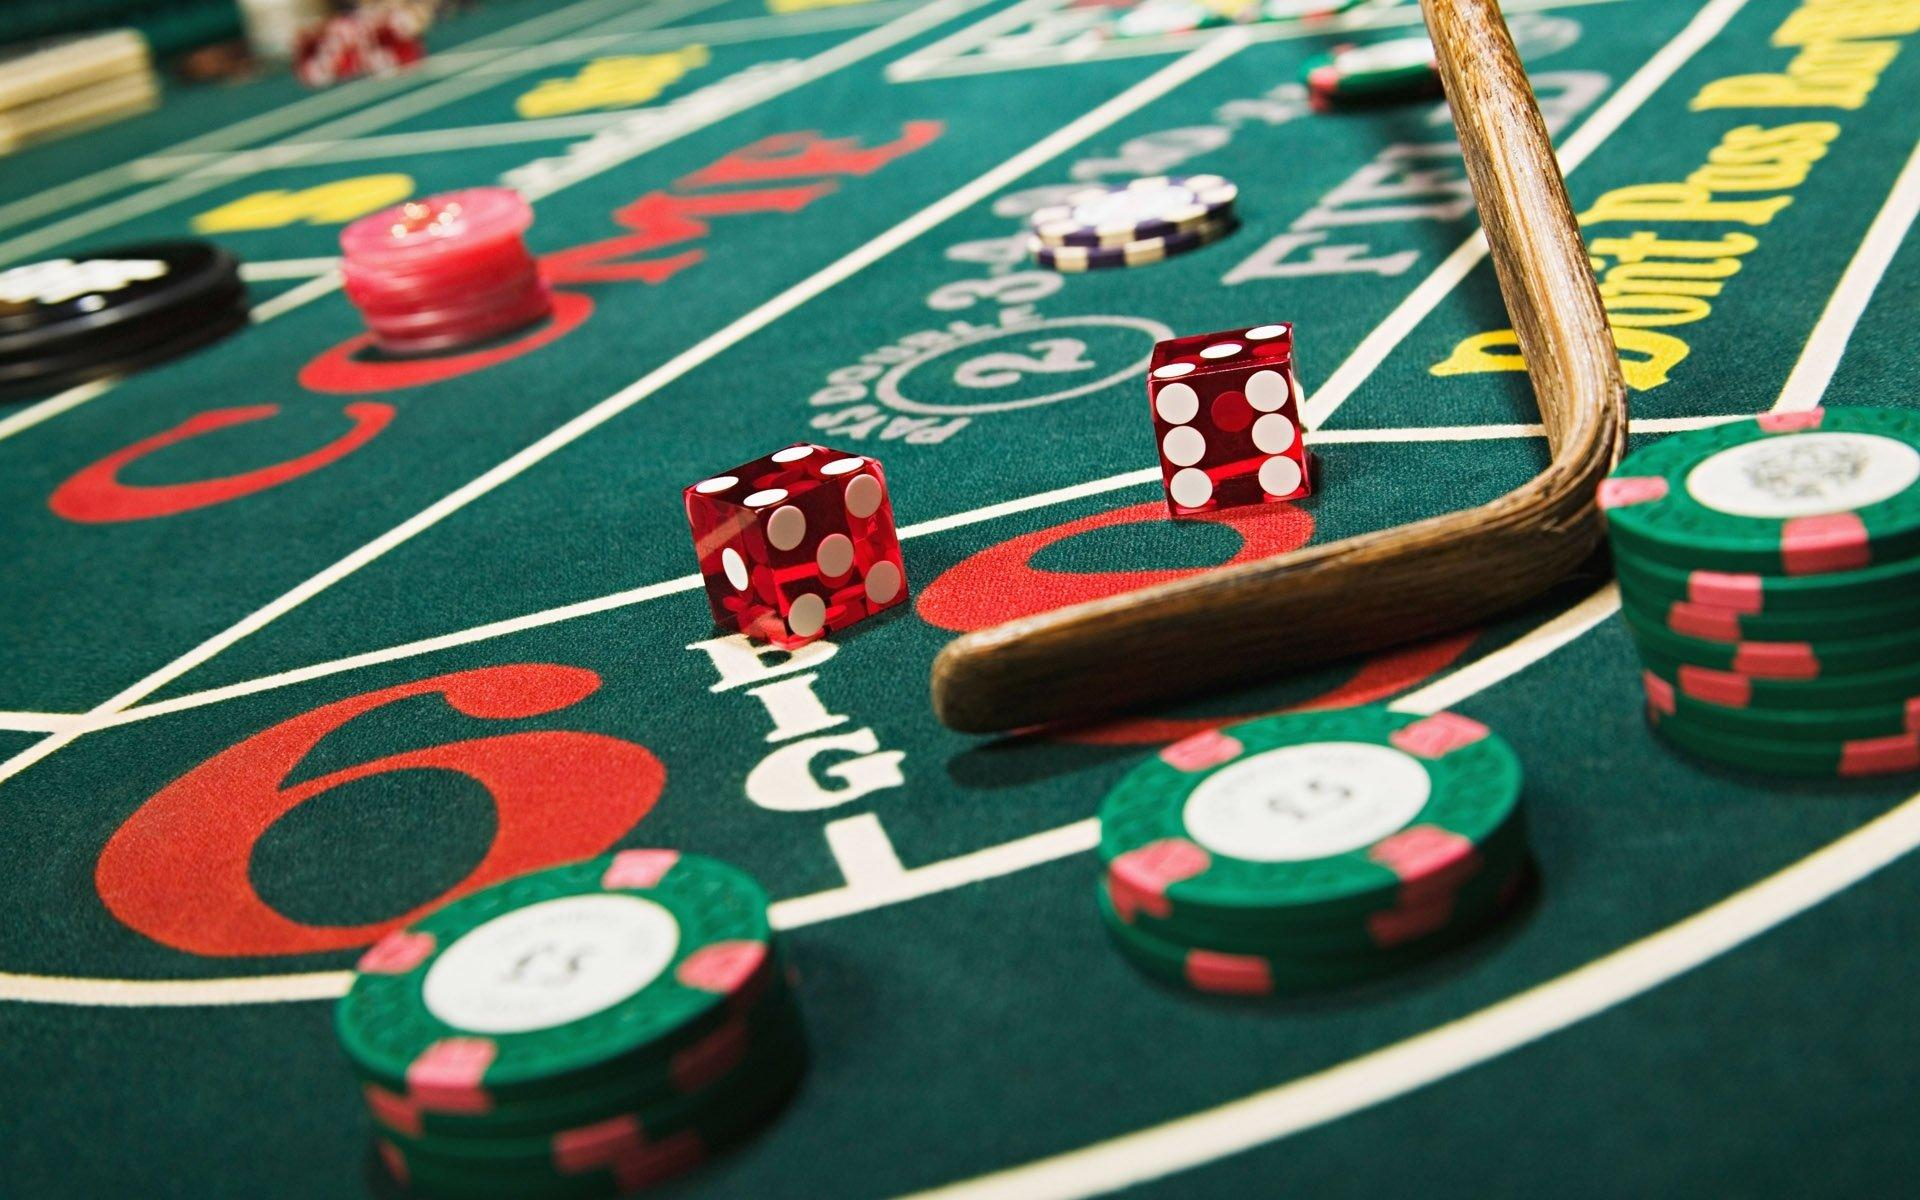 Be Cautious Casino Mistakes